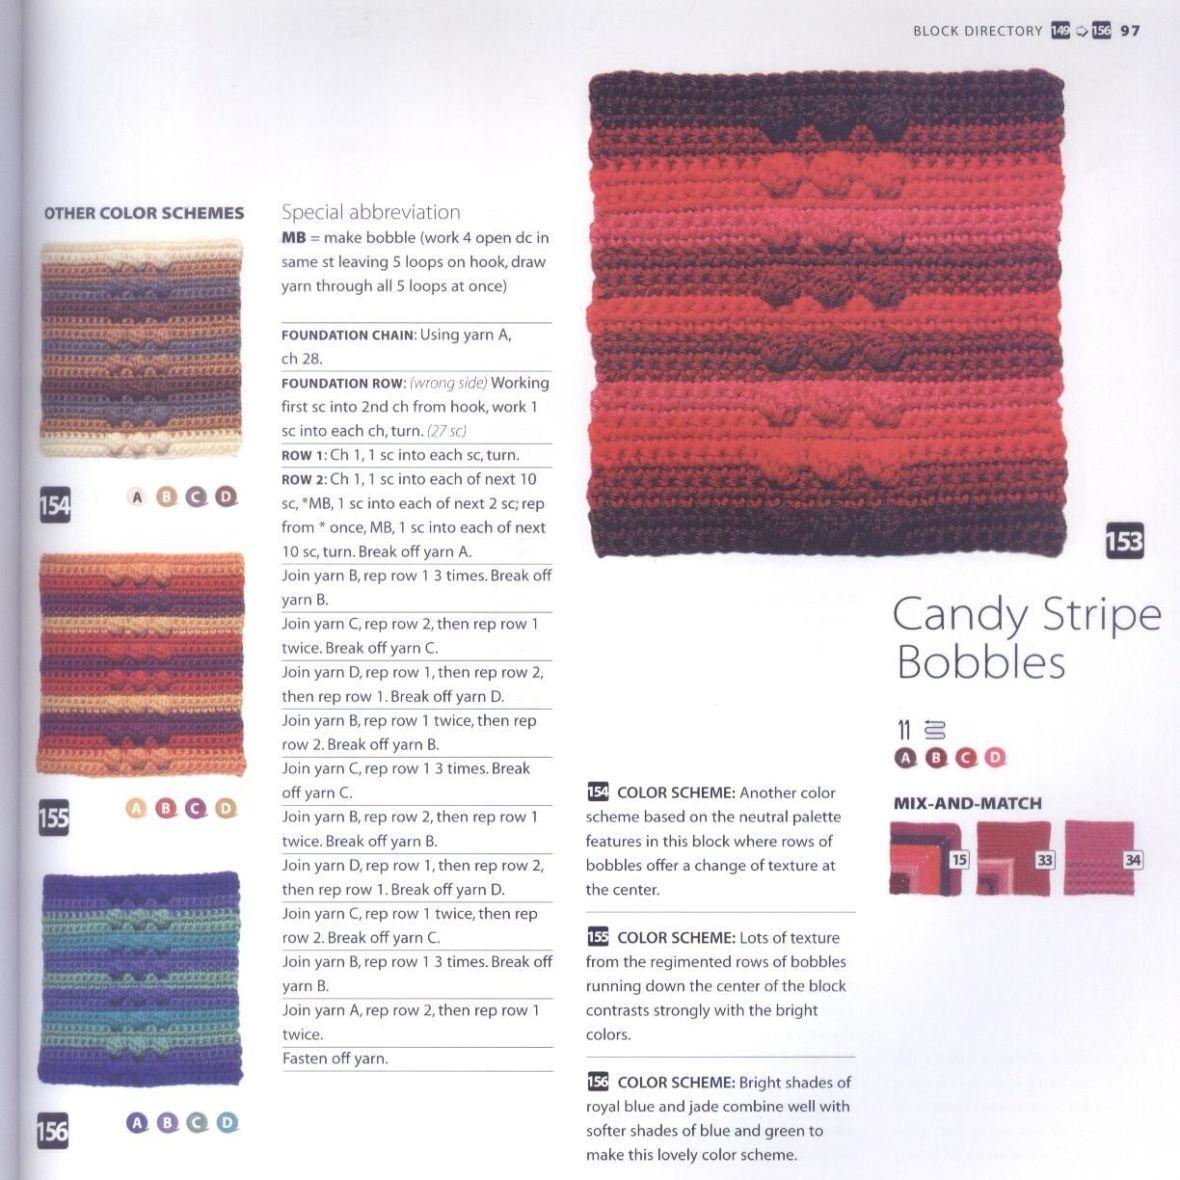 200 Crocheted Blocks for blankets, throws & Afghans 097